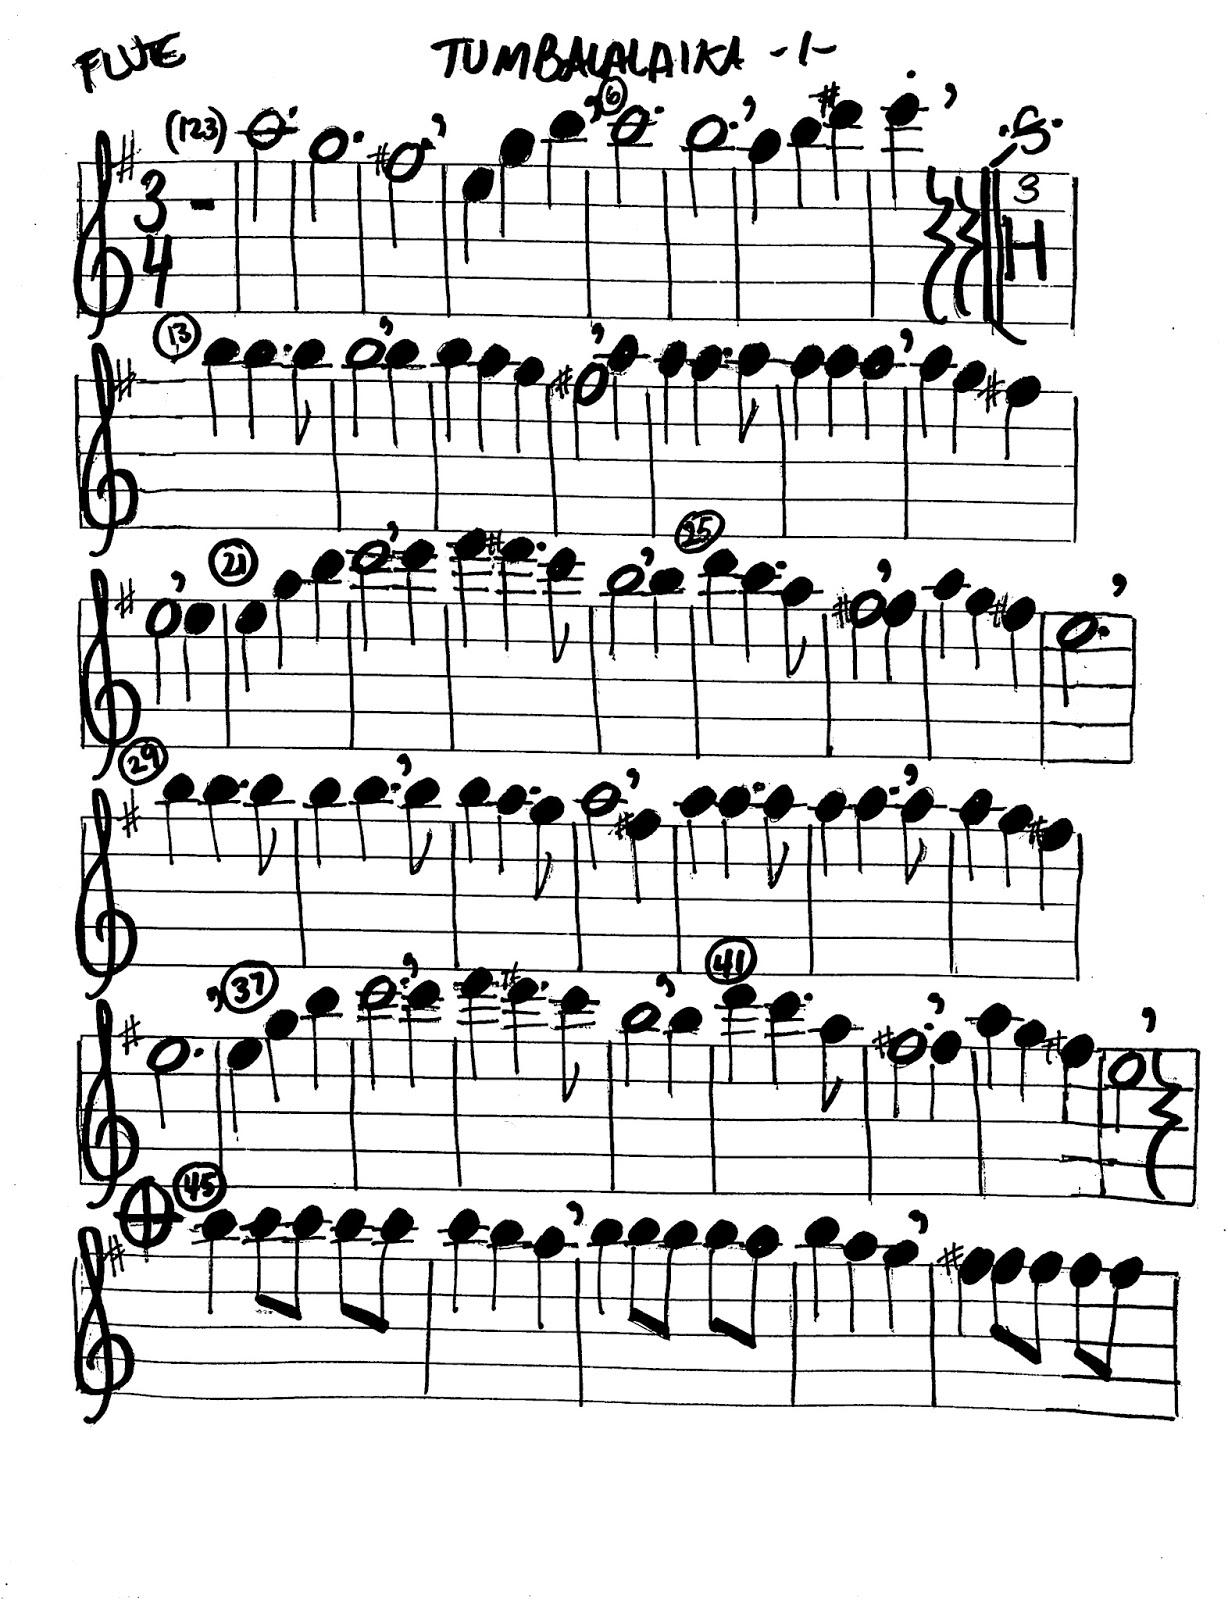 Miss Jacobson's Music: WINTER CONCERT MUSIC 2013: TUMBALALAIKA